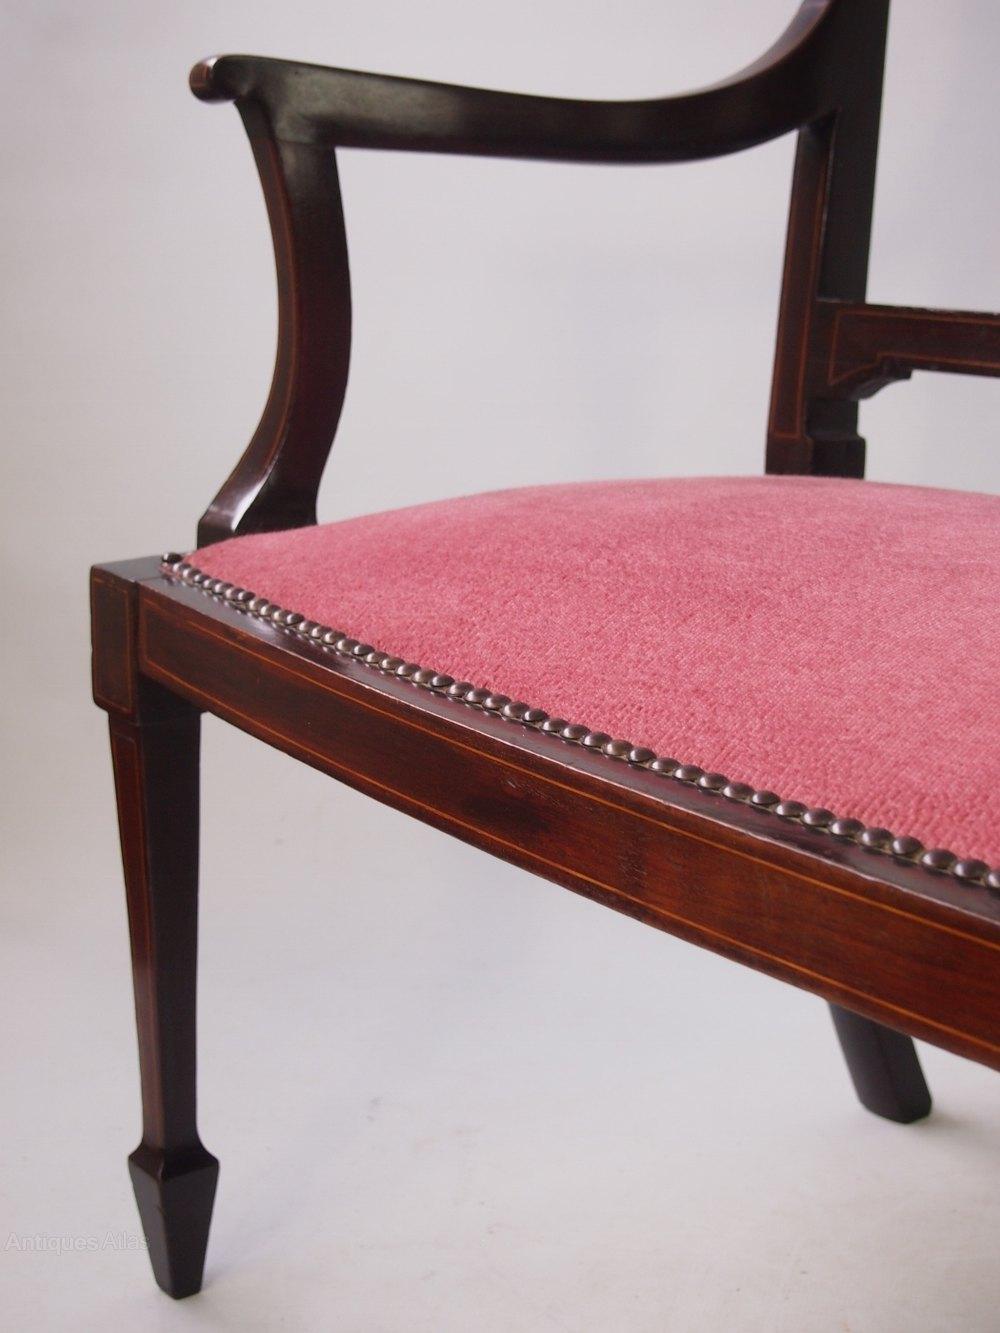 pink sofa dating uk mah jong size edwardian mahogany inlaid settee or - antiques atlas